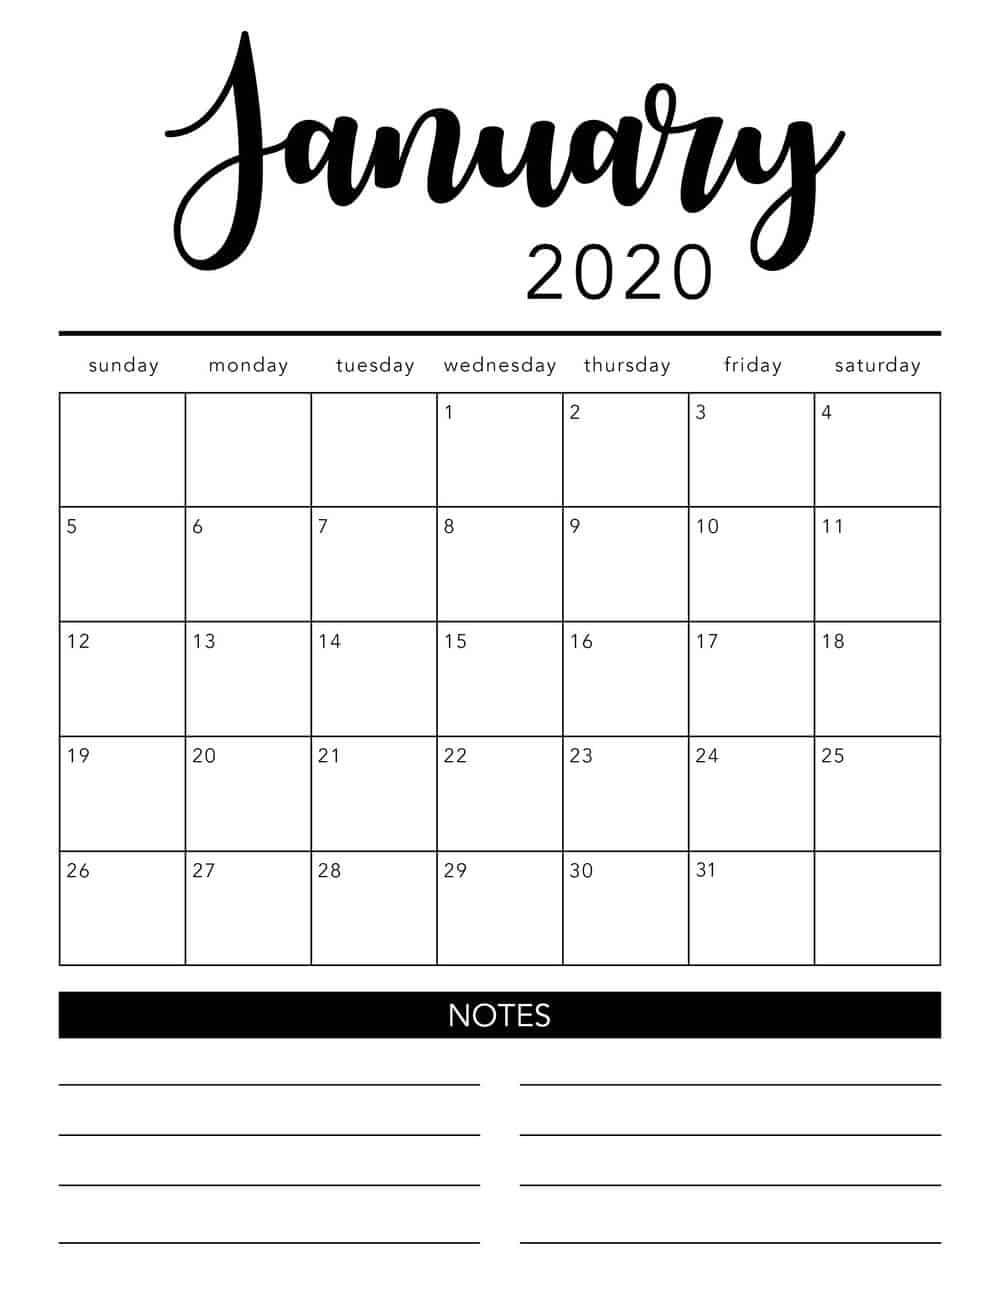 Printable 2020 Calendar by Month Free 2020 Printable Calendar Template 2 Colors I